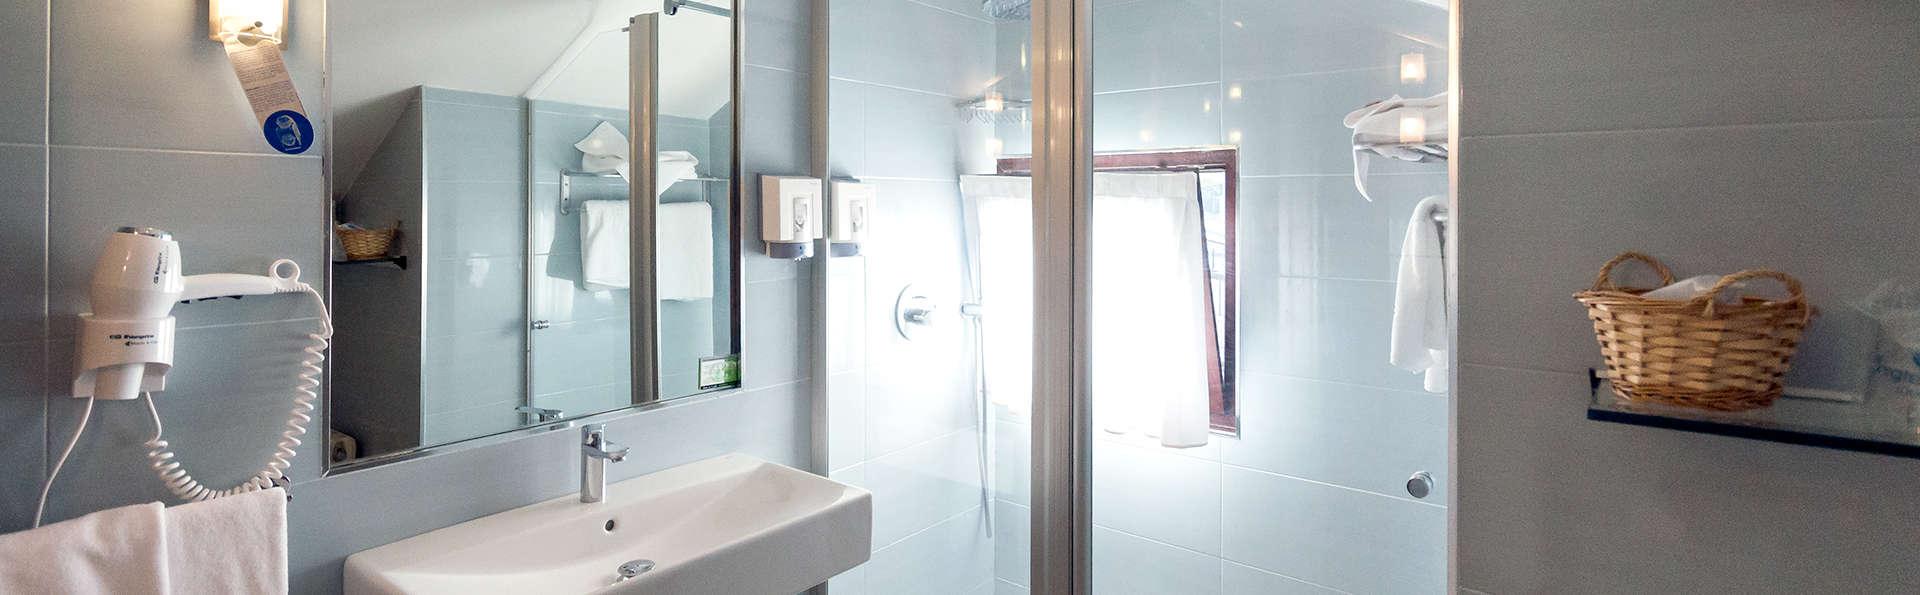 Hotel Bemon Playa - Edit_Bathroom4.jpg